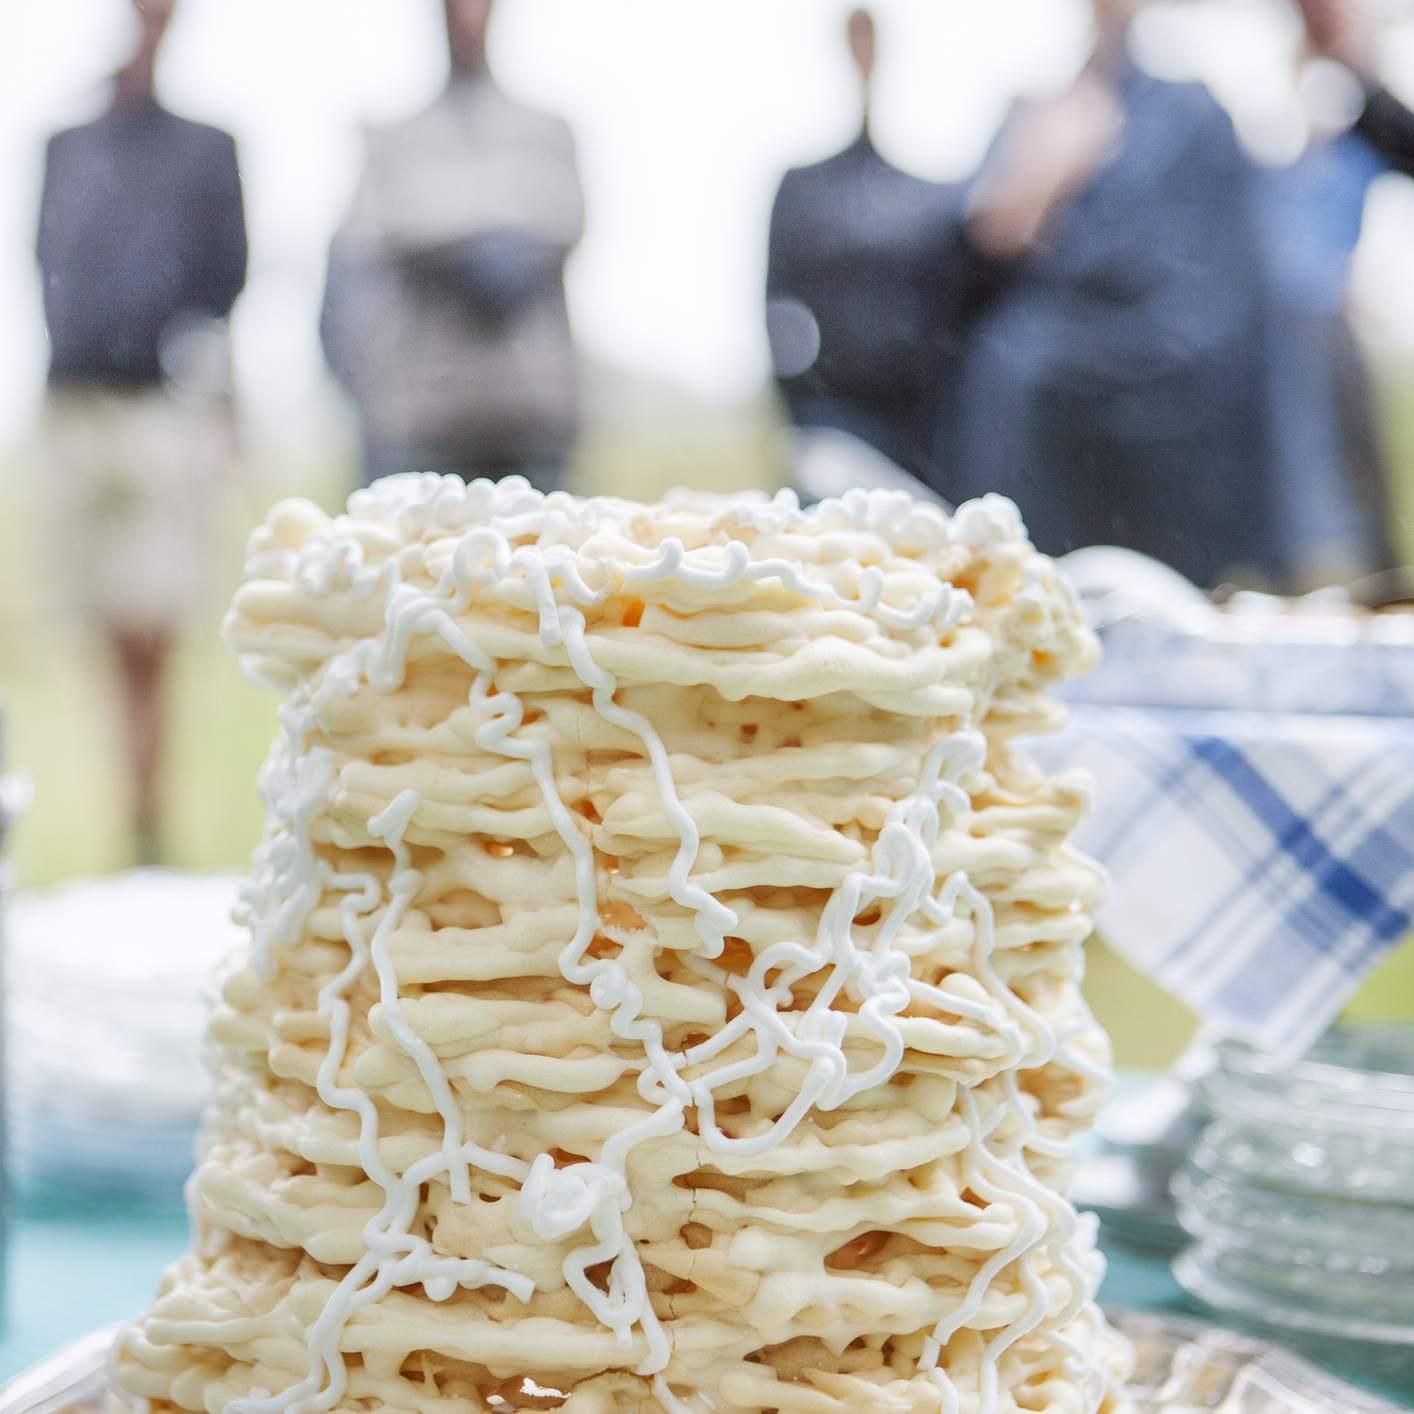 Close up of Spettekaka cake